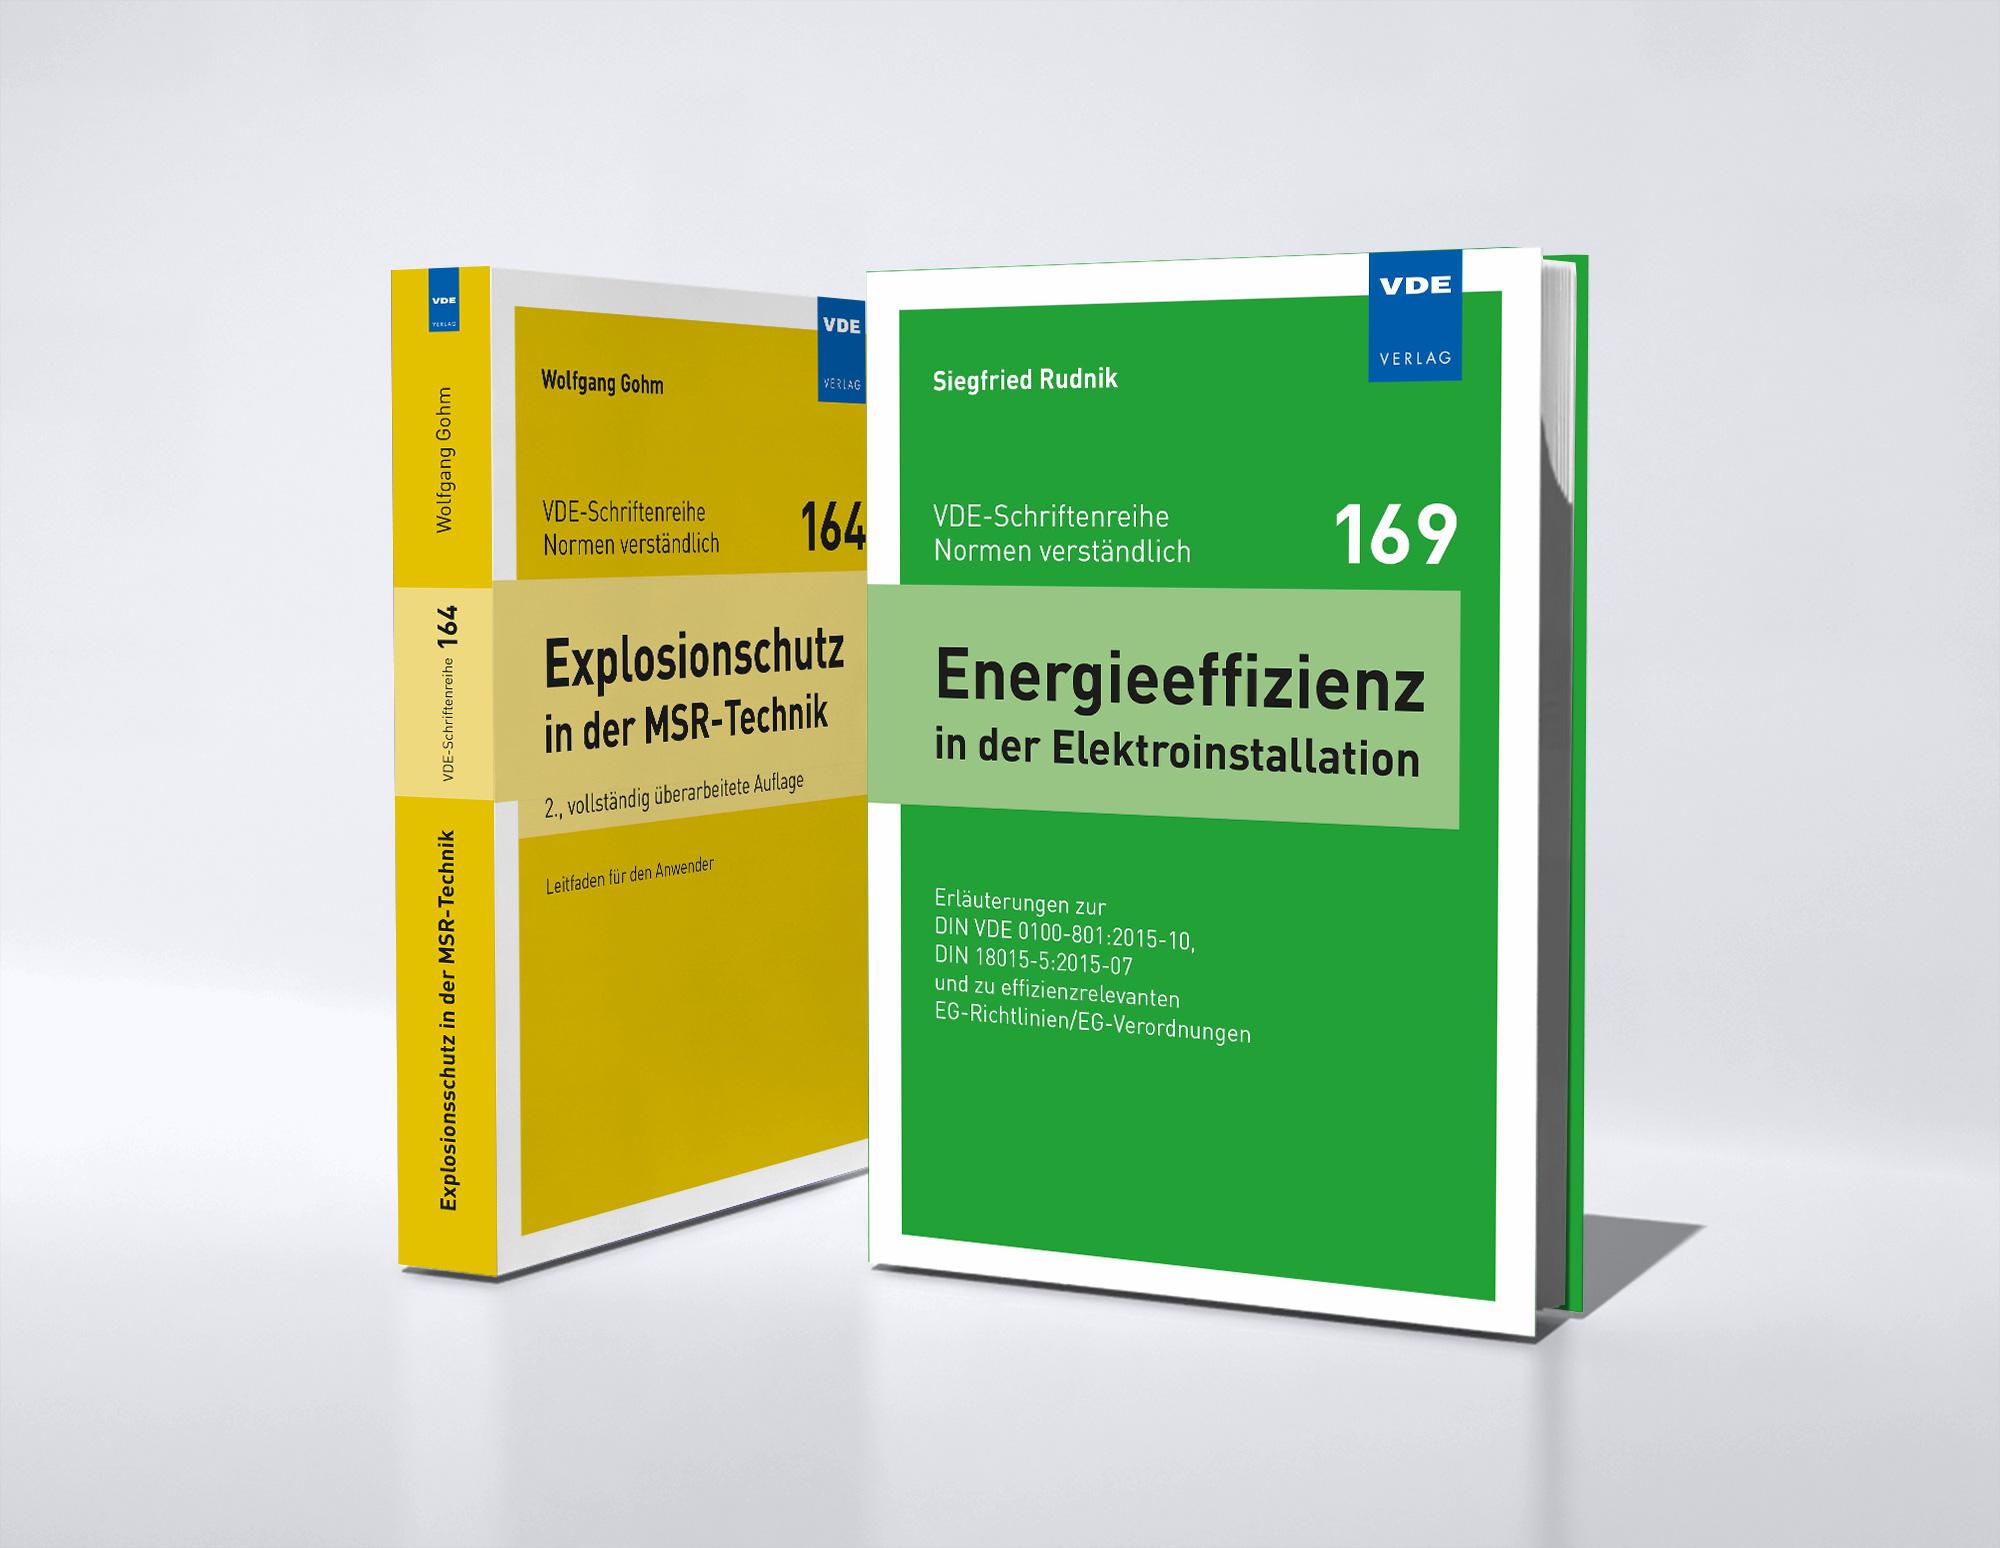 VDE_Schriftenreihe_Web